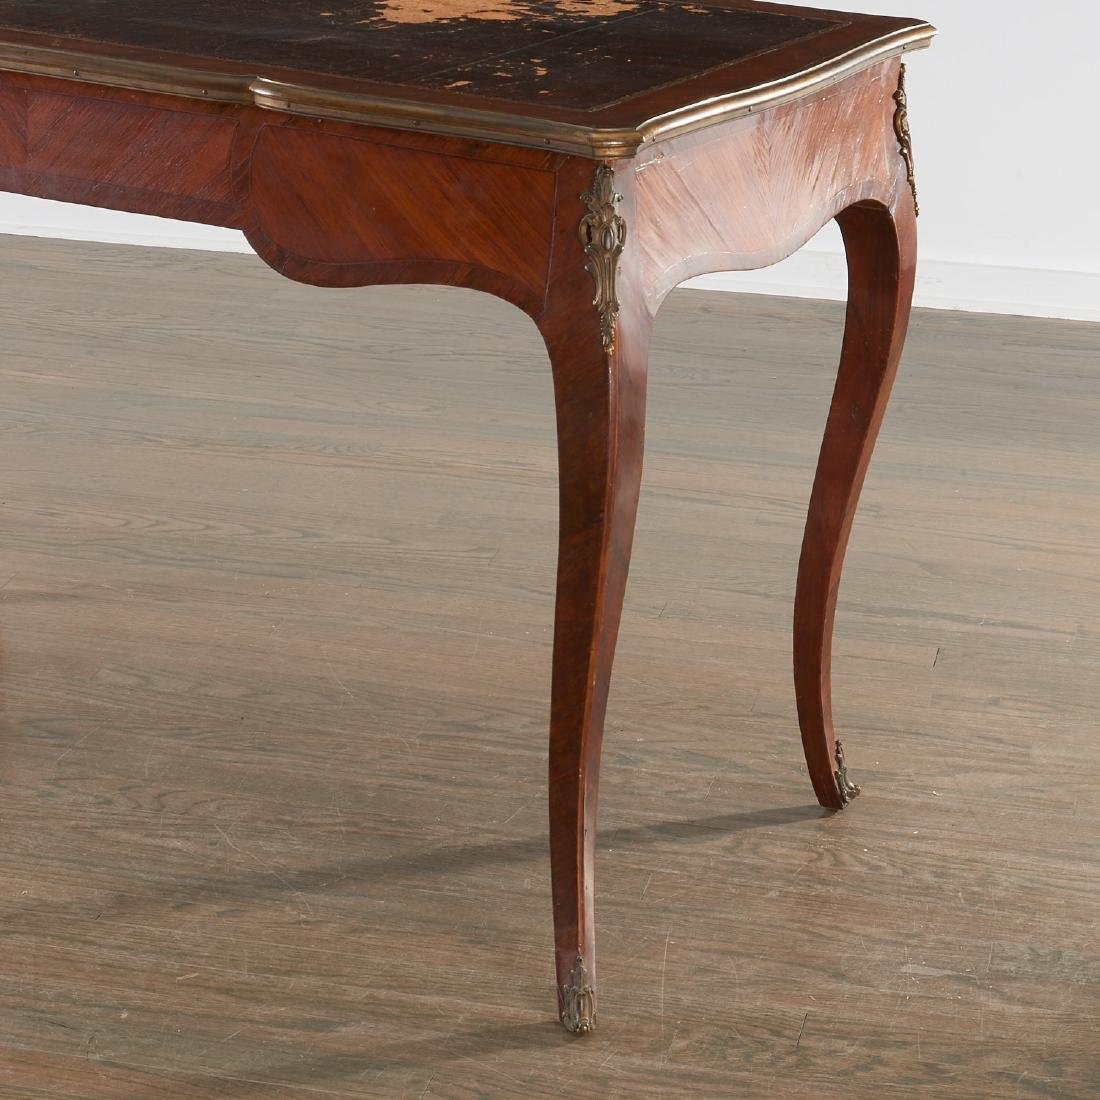 Louix XV bronze mounted mahogany bureau plat - 5